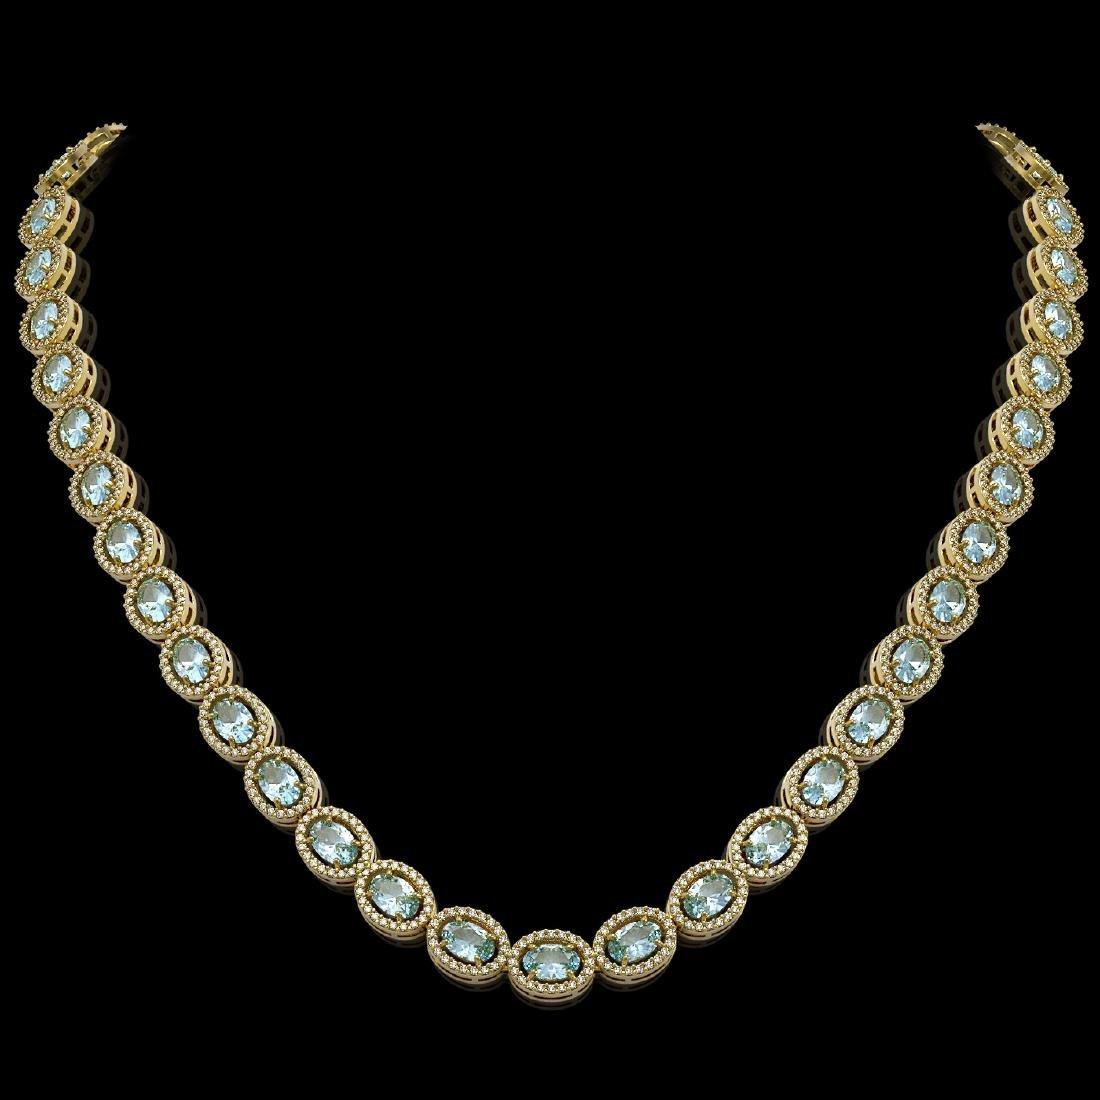 24.65 CTW Aquamarine & Diamond Halo Necklace 10K Yellow